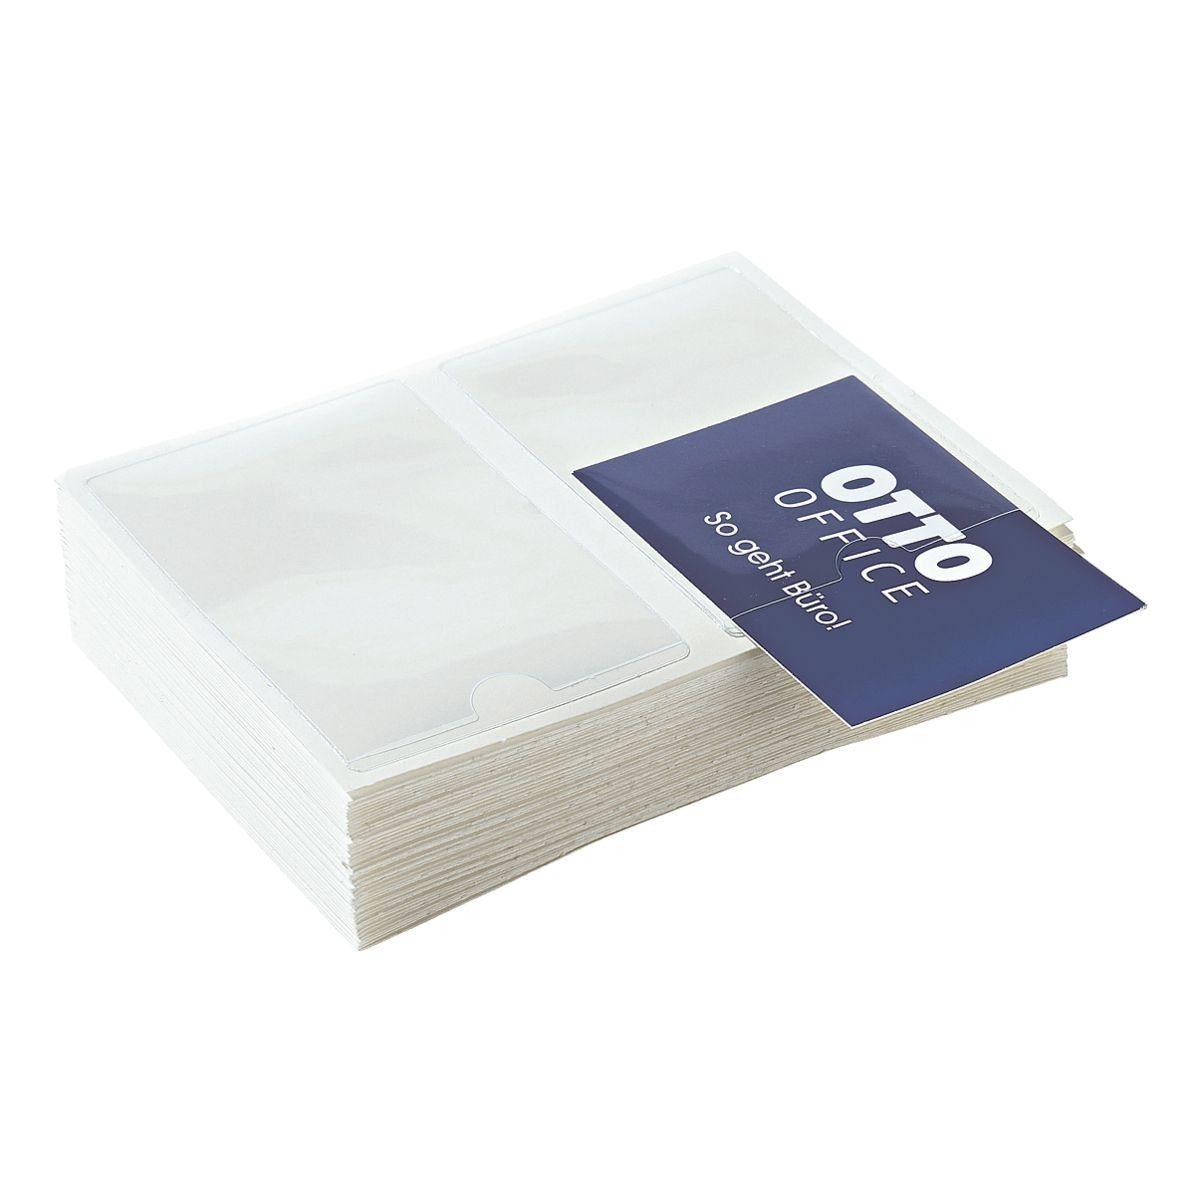 Probeco Selbstklebende Visitenkartenhüllen